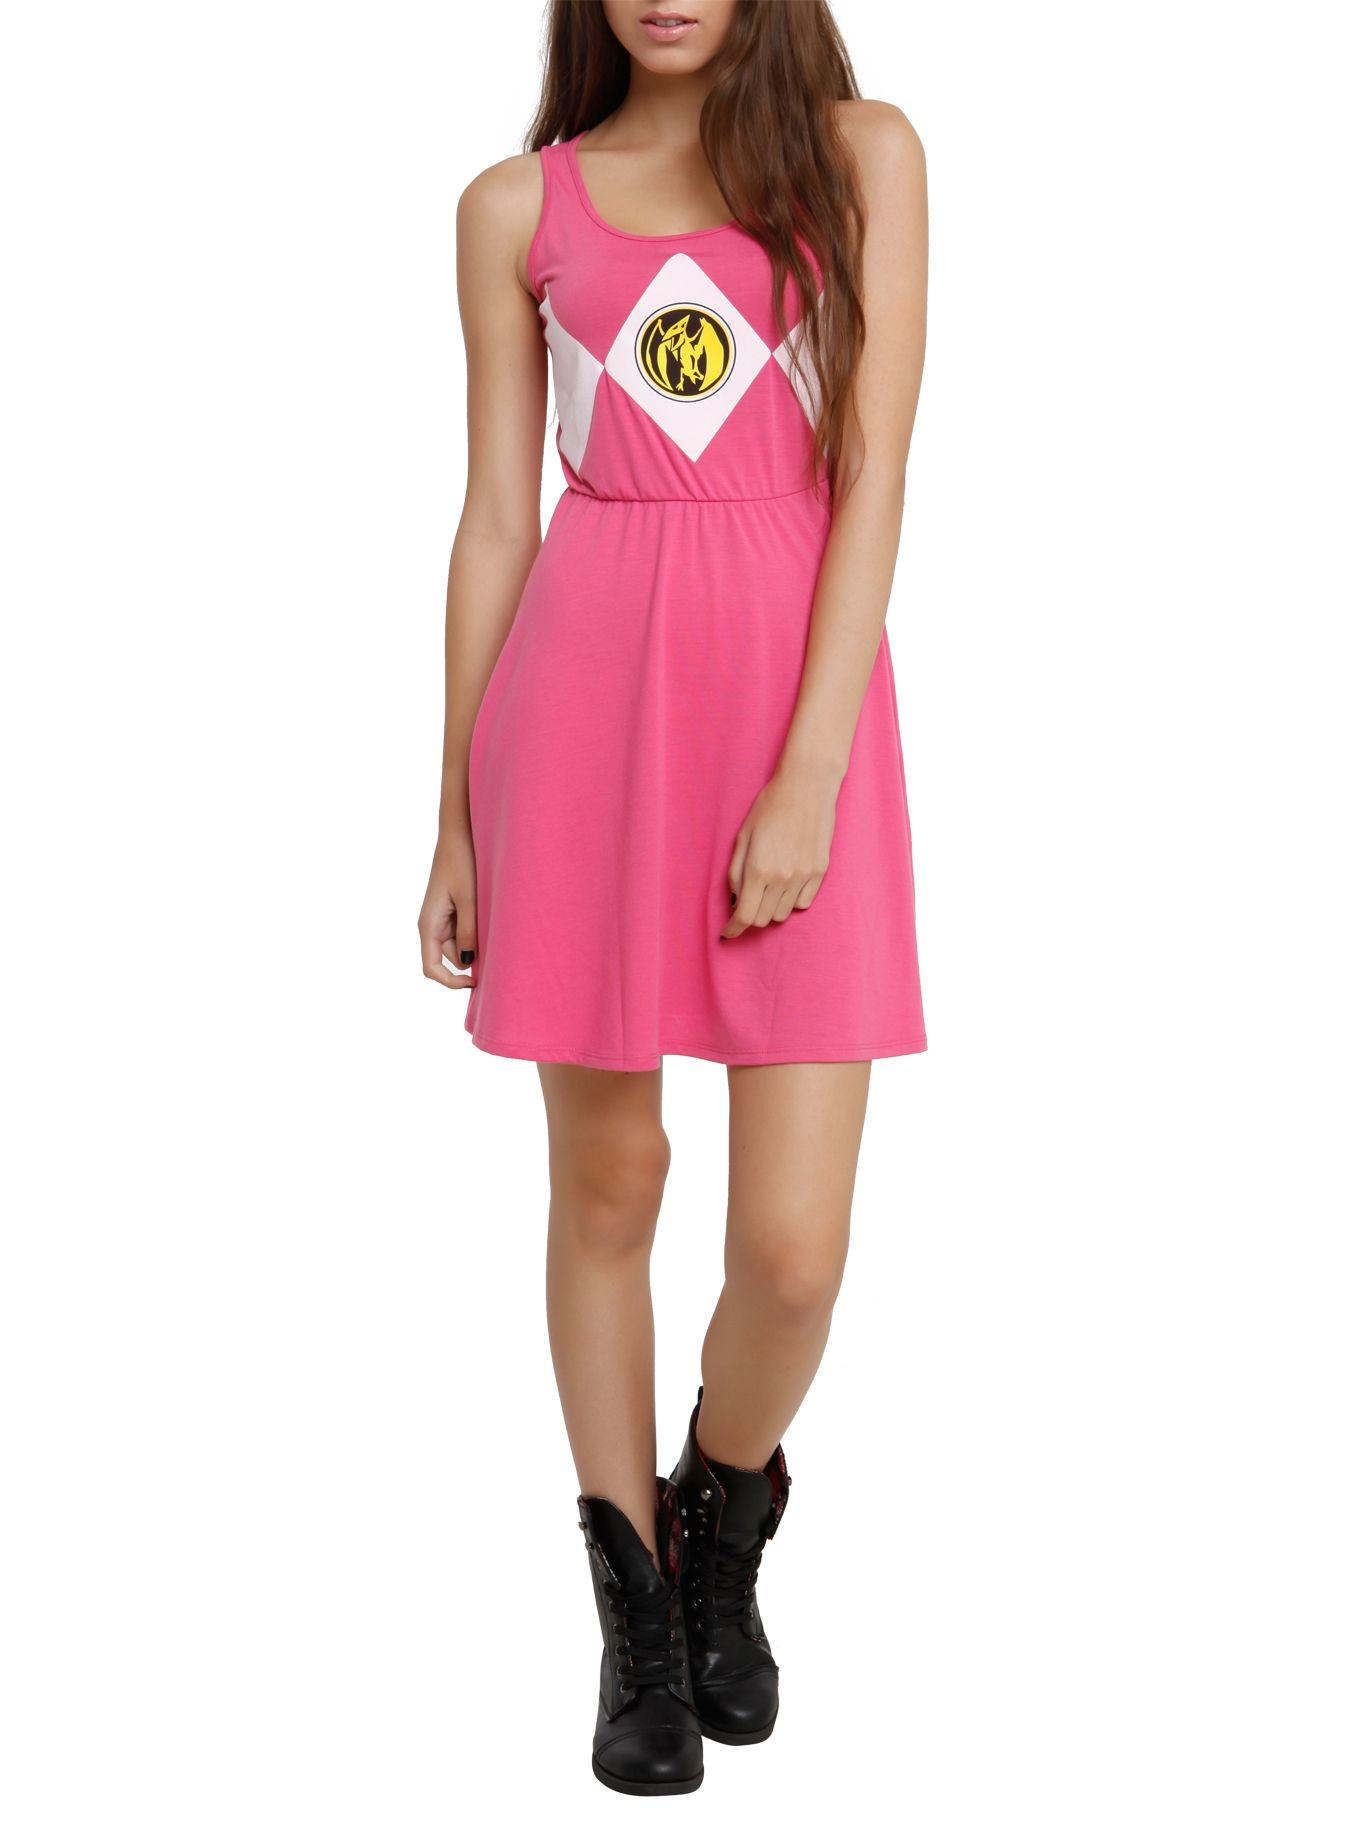 Mighty Morphin Power Rangers Pink Ranger Costume Dress | Hot Topic ...